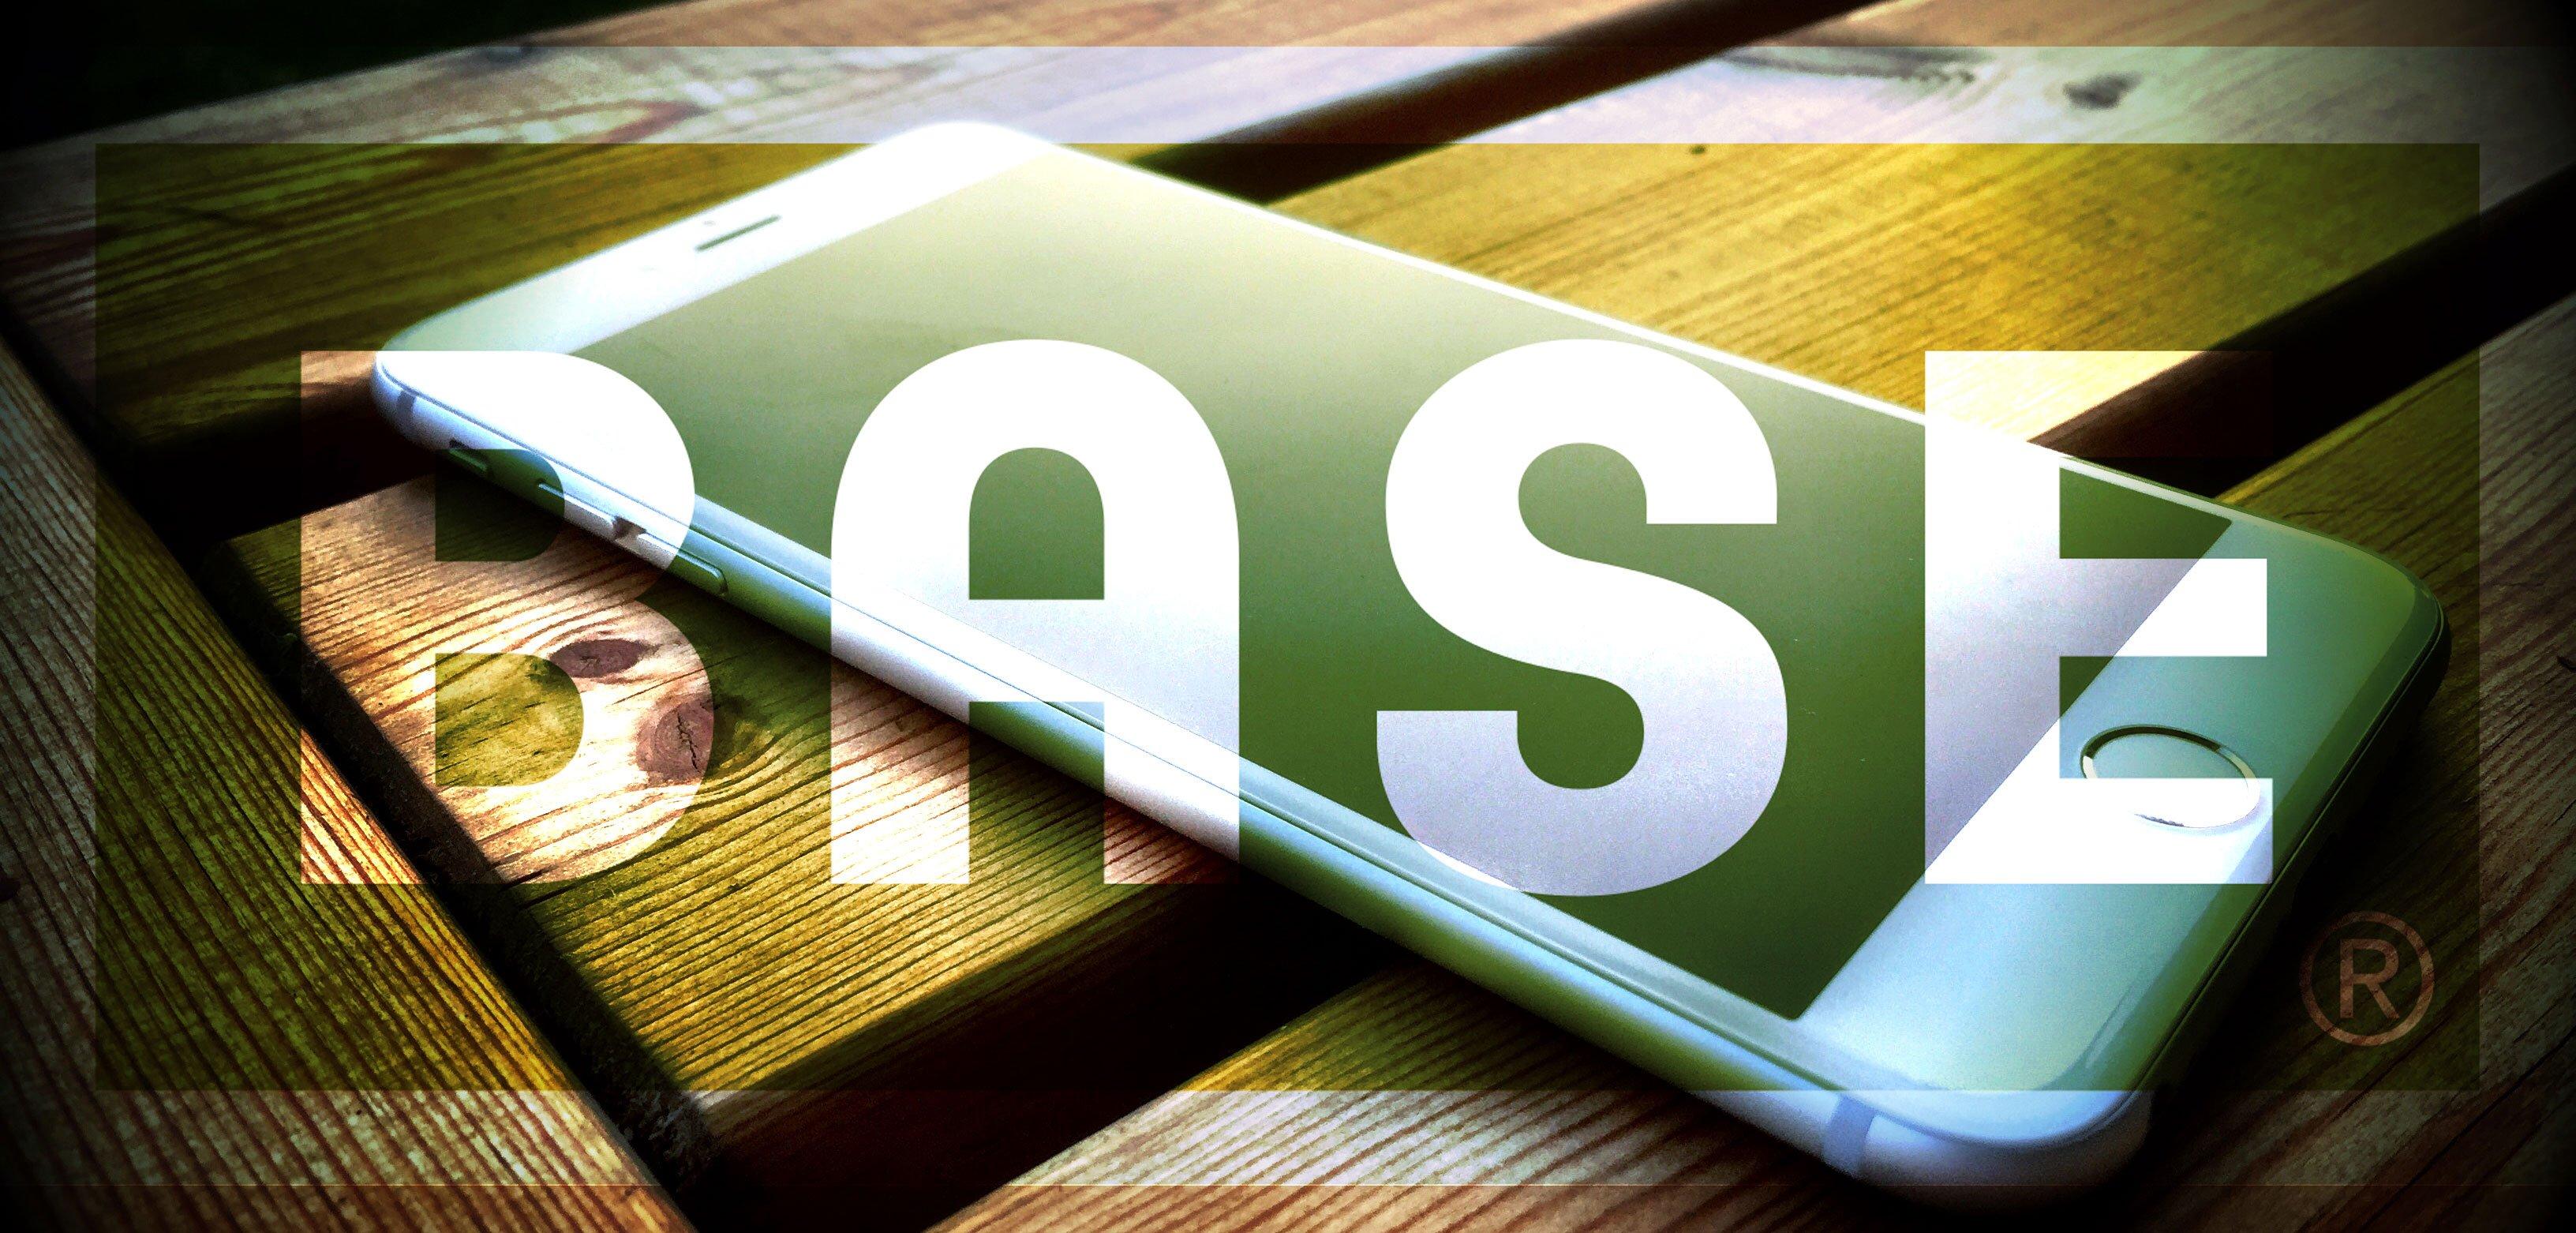 BASE macht mobil: Mehr Internet - Doppeltes Volumen! 7